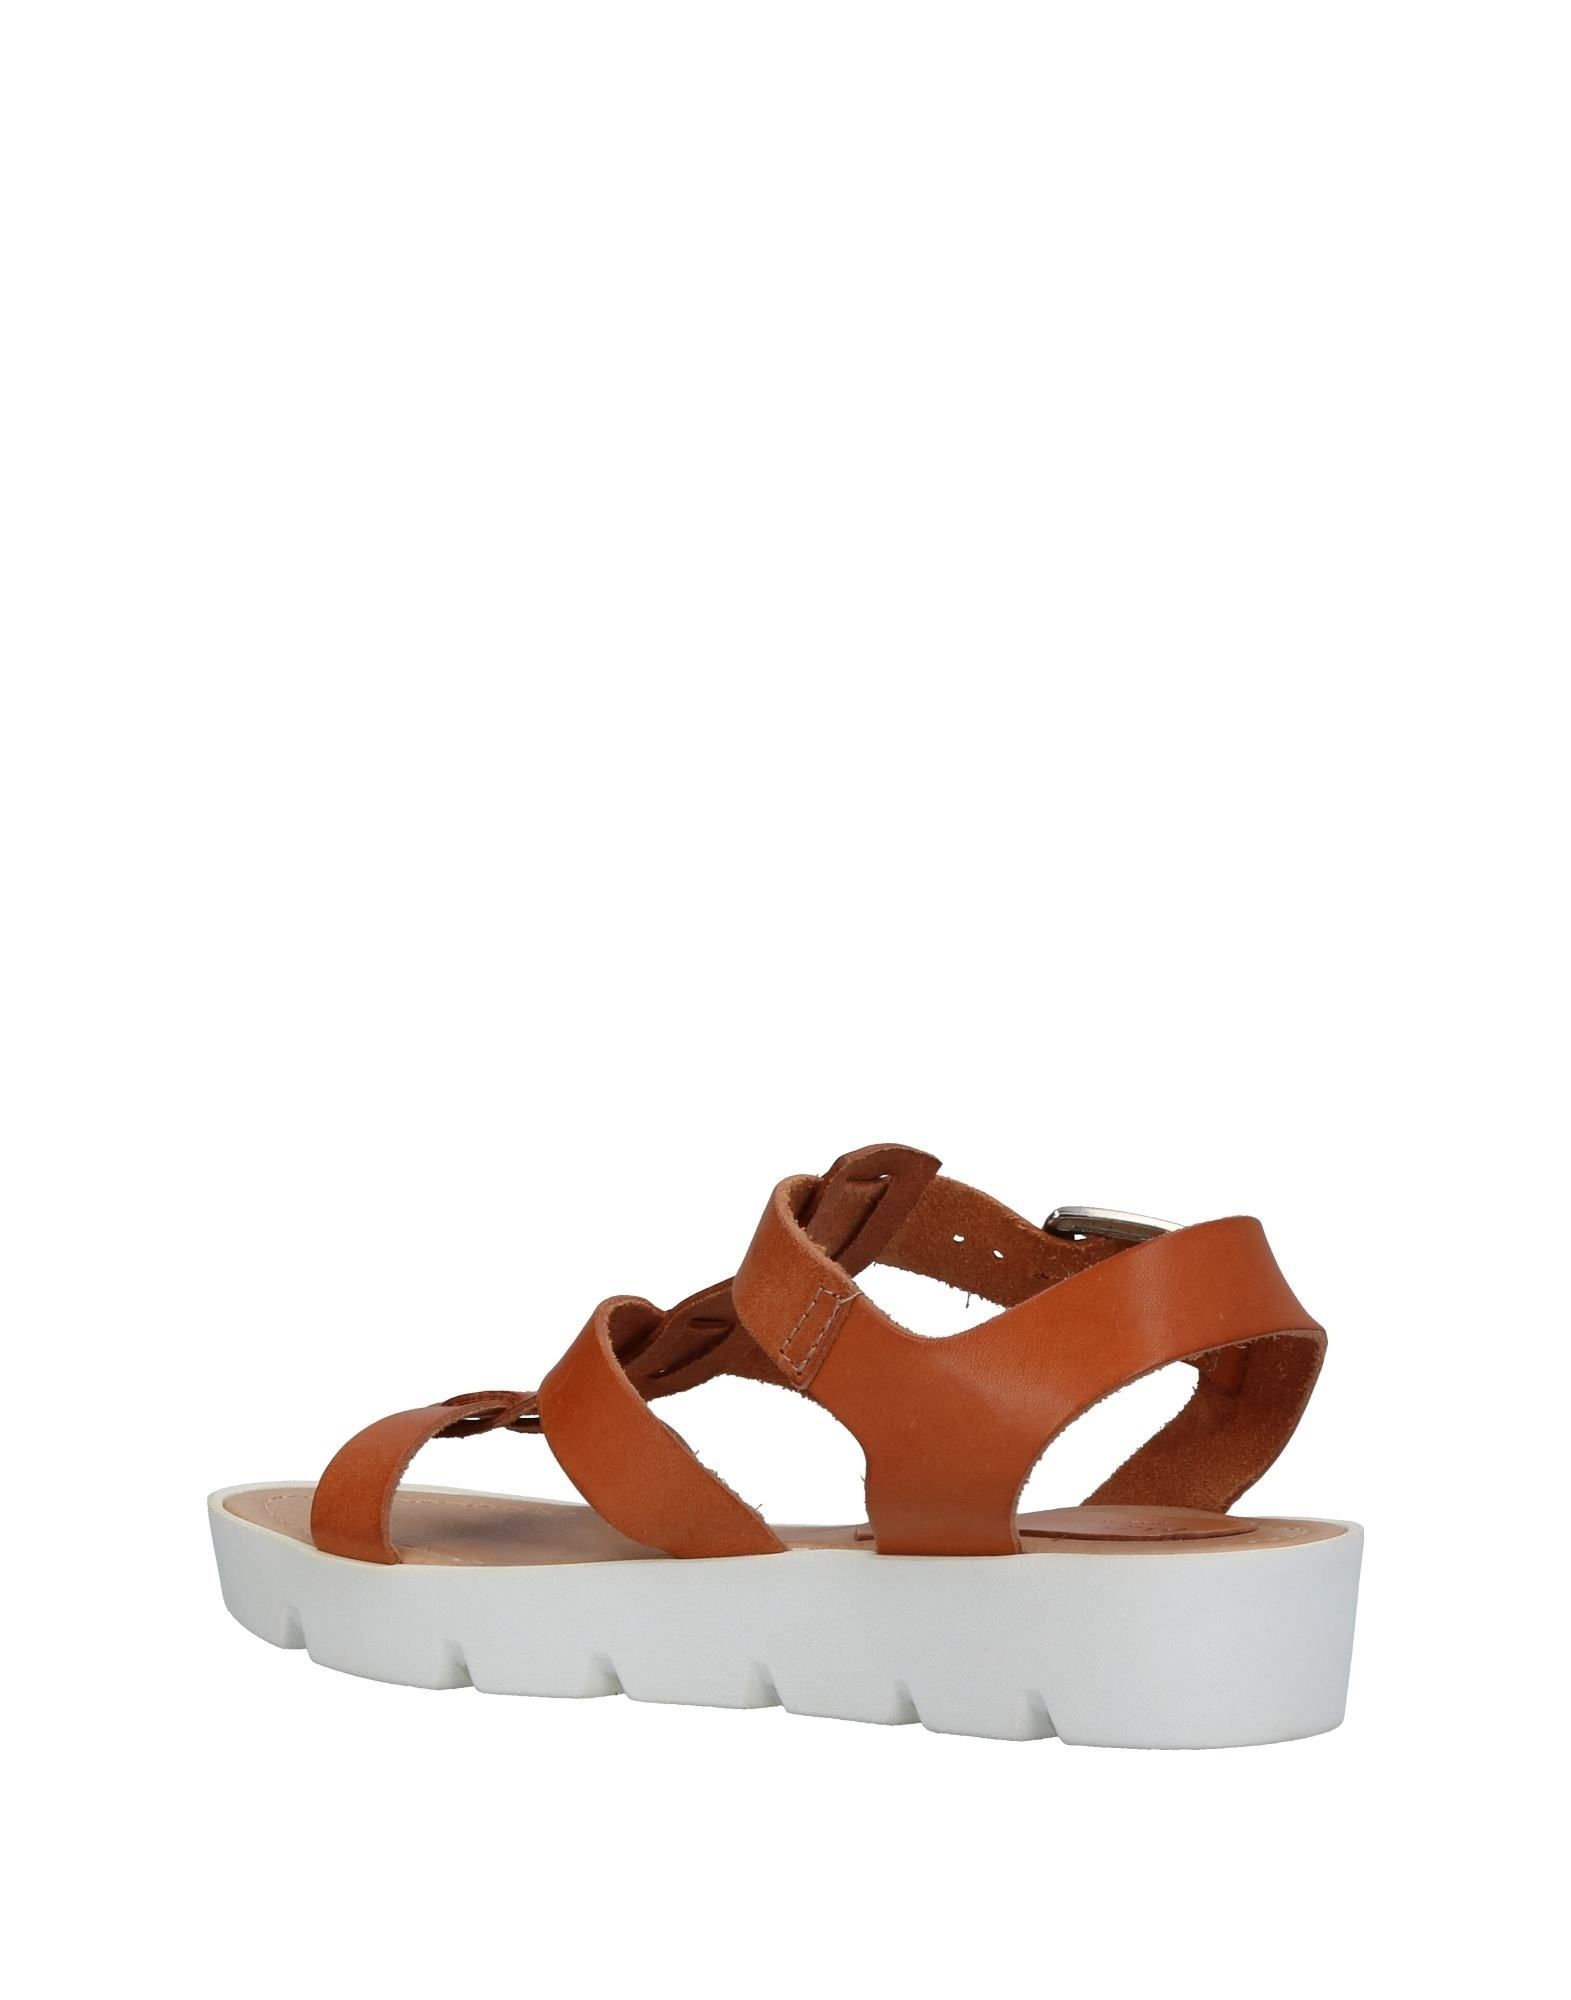 Carlo Pazolini Tan Leather Sandals